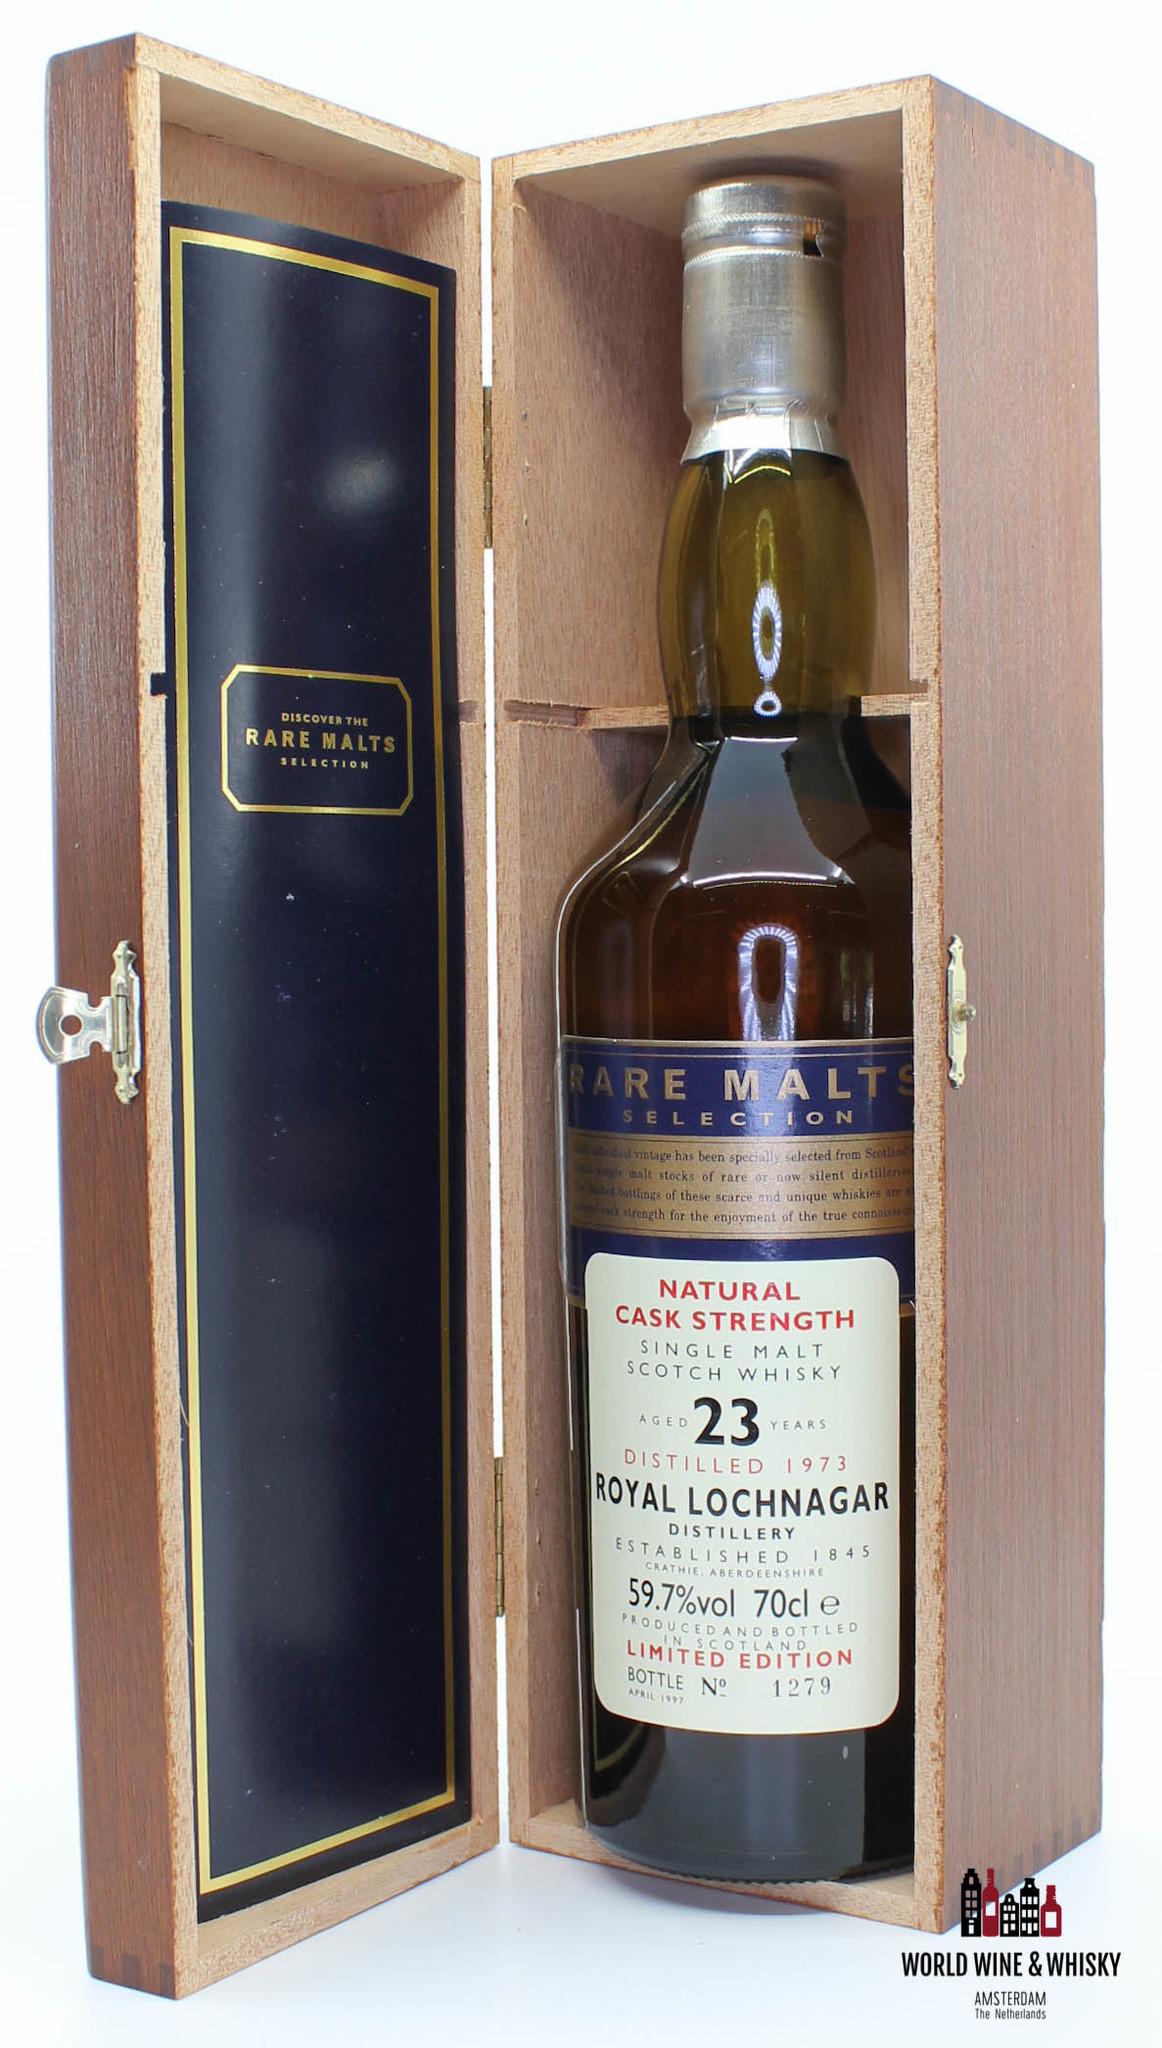 Royal Lochnagar Royal Lochnagar 23 Years Old 1973 1997 Rare Malts Selection 59.7% (in wooden box)